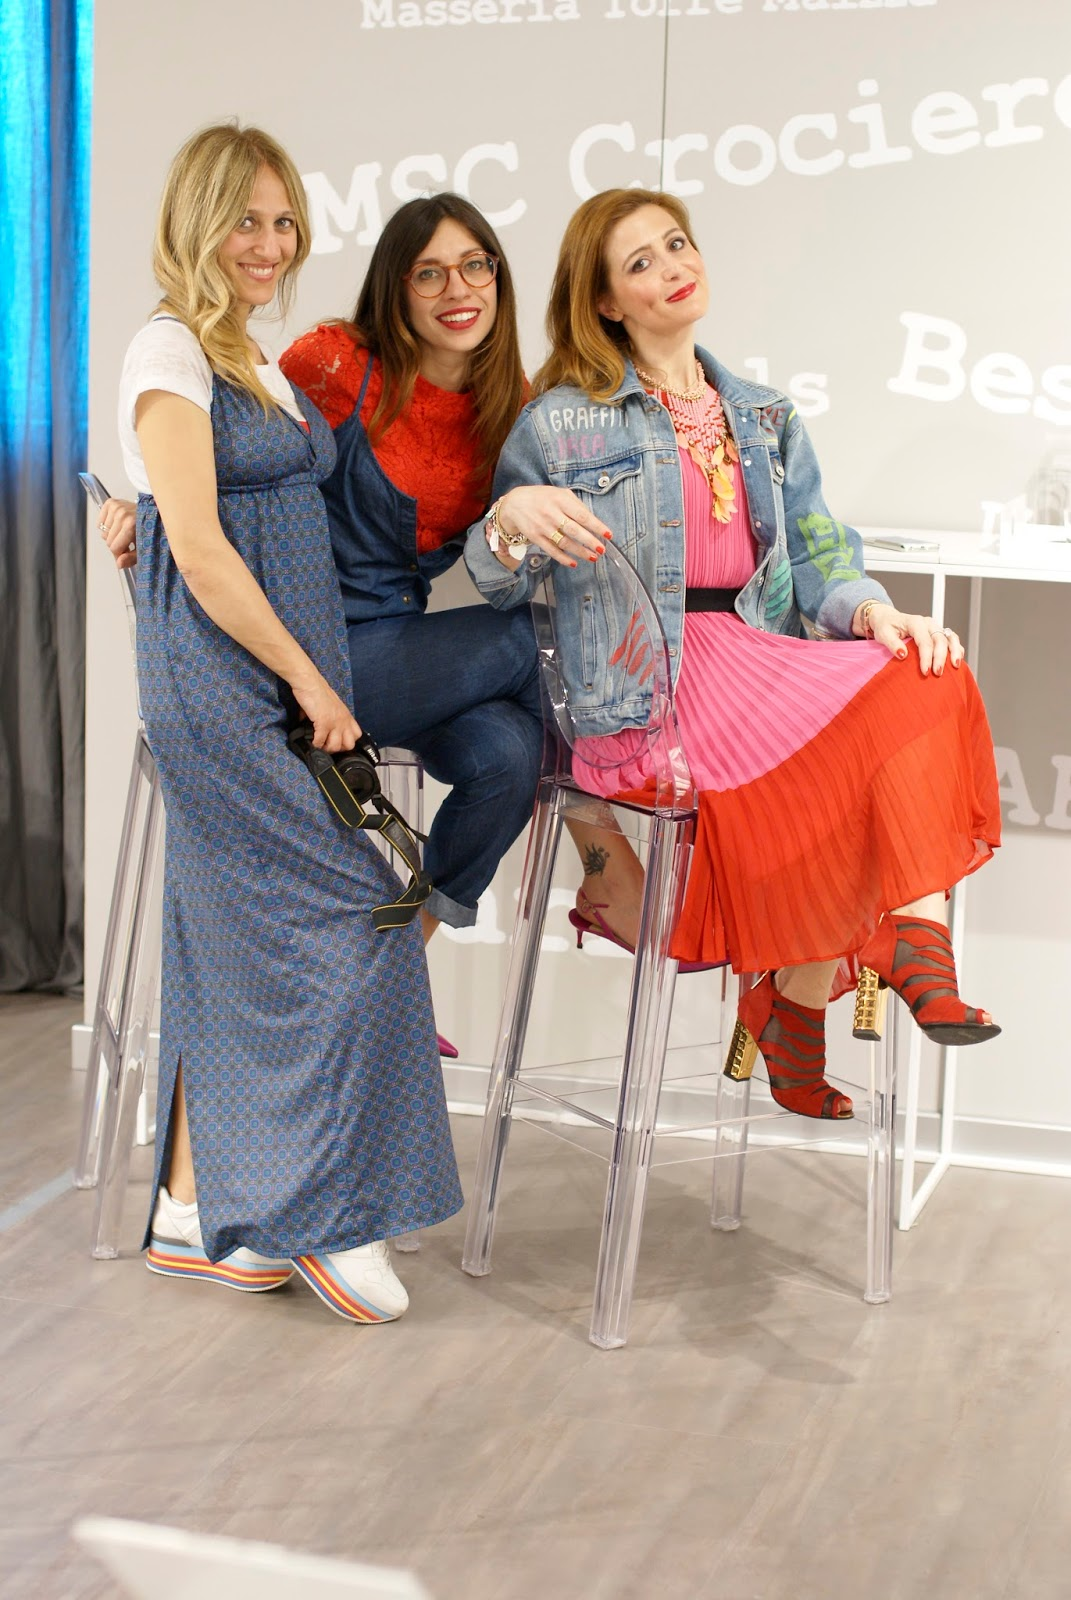 BlogTour at Dorelan: Angela Pavese, Iolanda Corio and me on Fashion and Cookies fashion blog, fashion blogger style